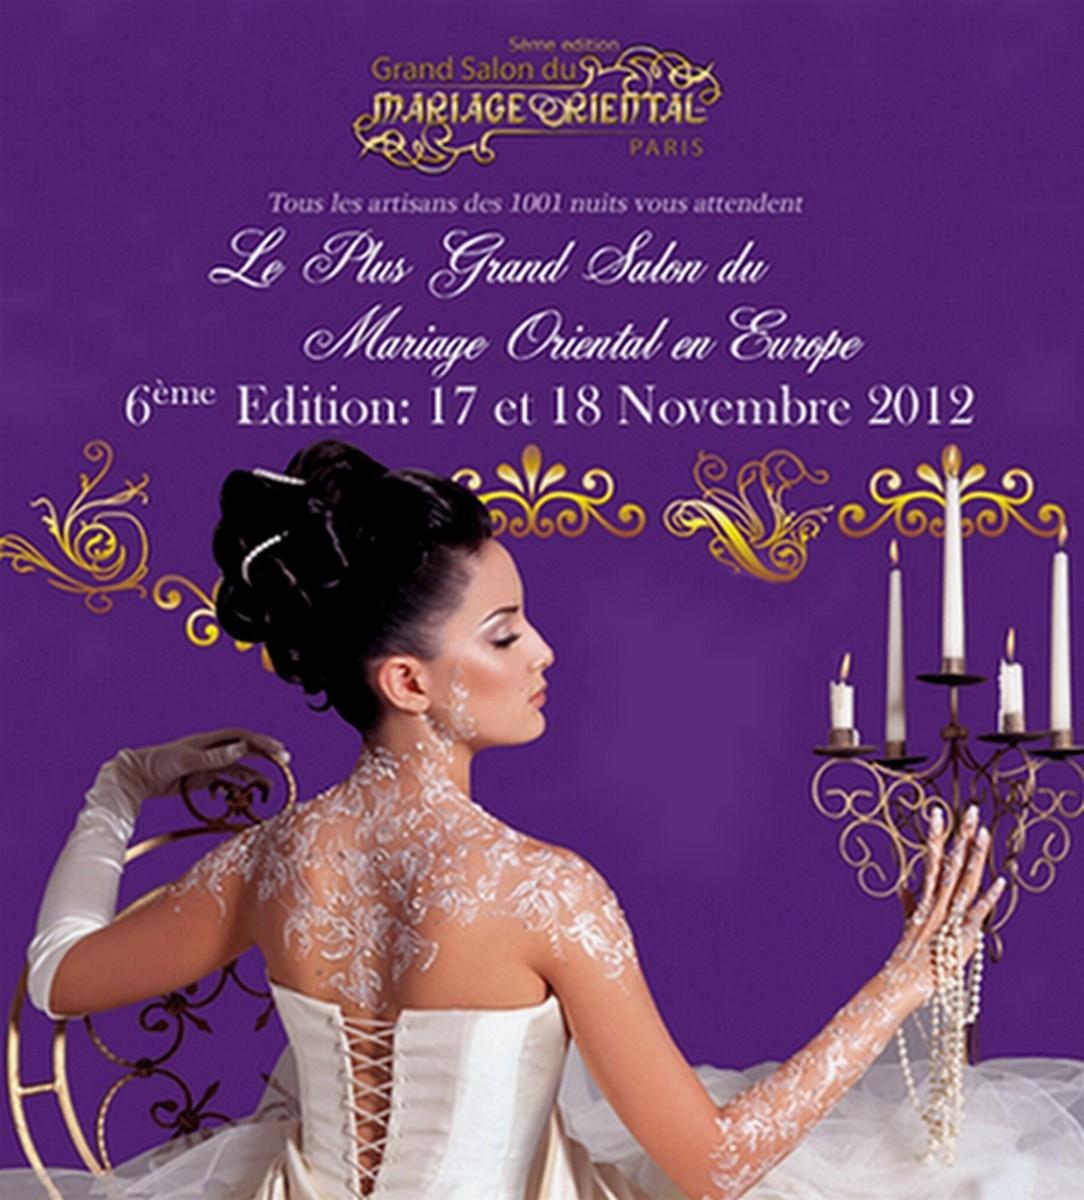 Grand salon du mariage oriental 2012 - Salon du mariage oriental ...